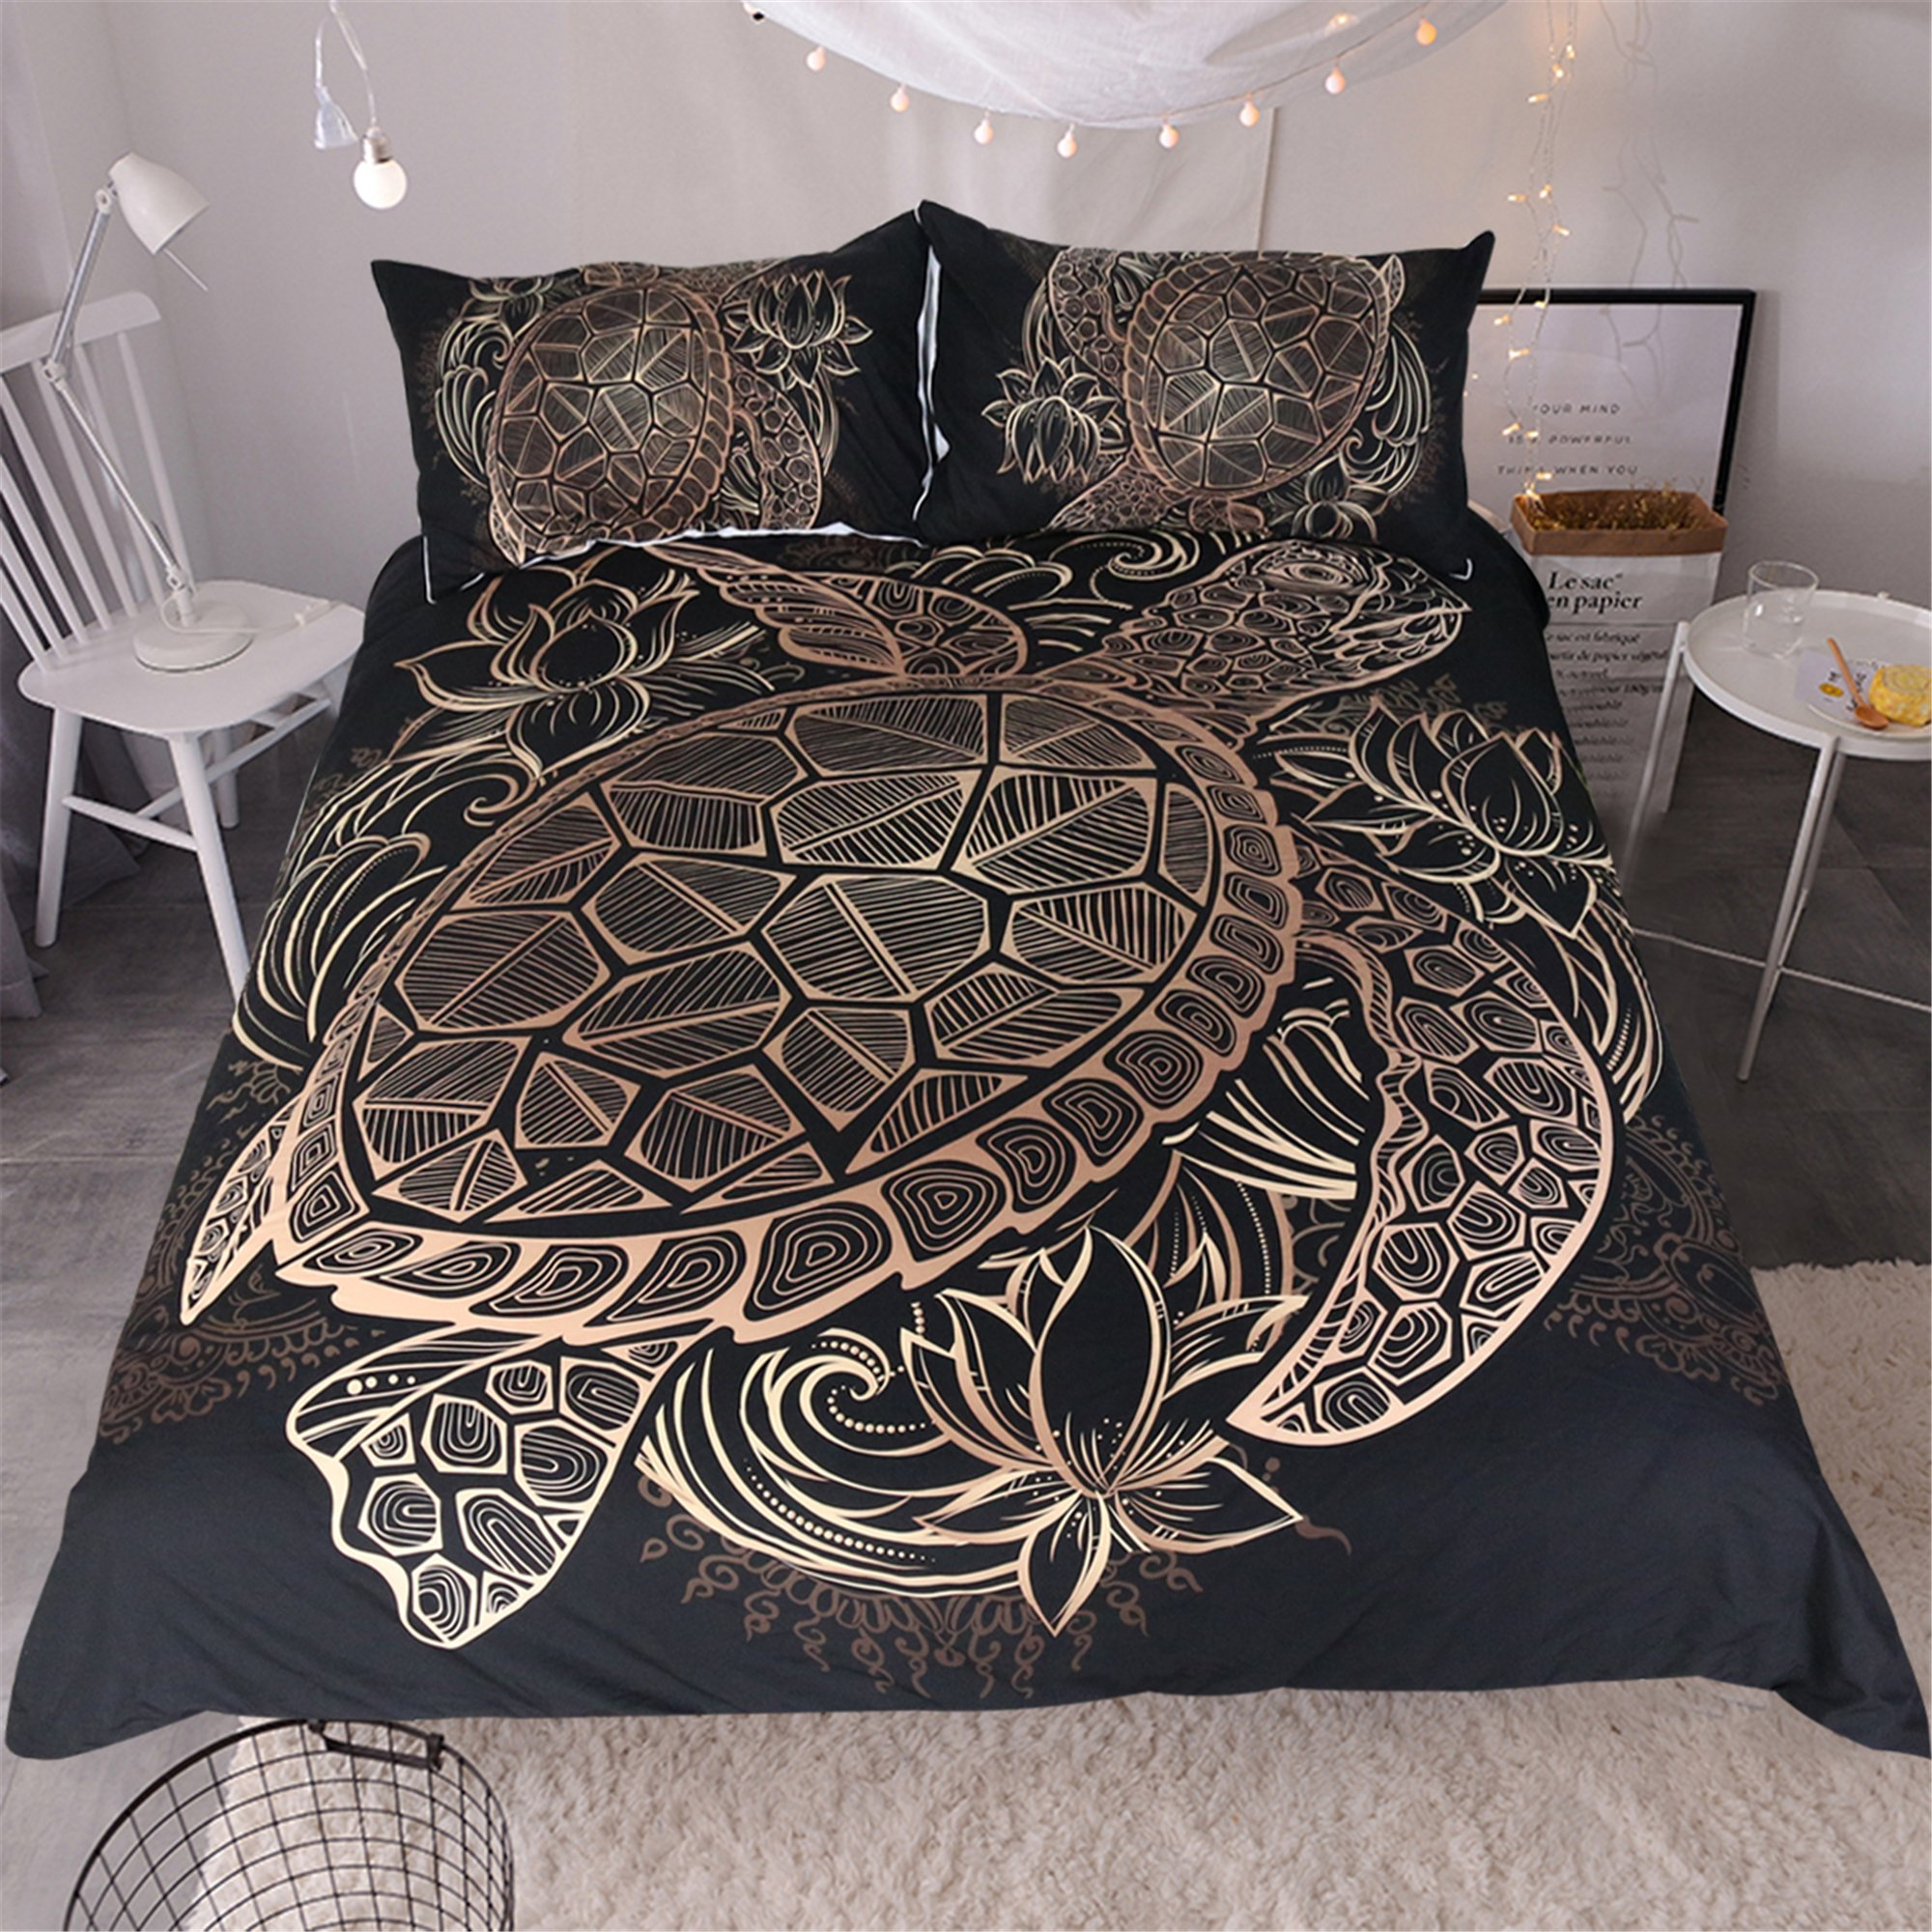 Sleepwish Gold Black Tortoise Bedding 3D Printed Golden Duvet Cover Turtle Floral Pattern Funky Duvet Cover Bedspread Quilt Cover (King)